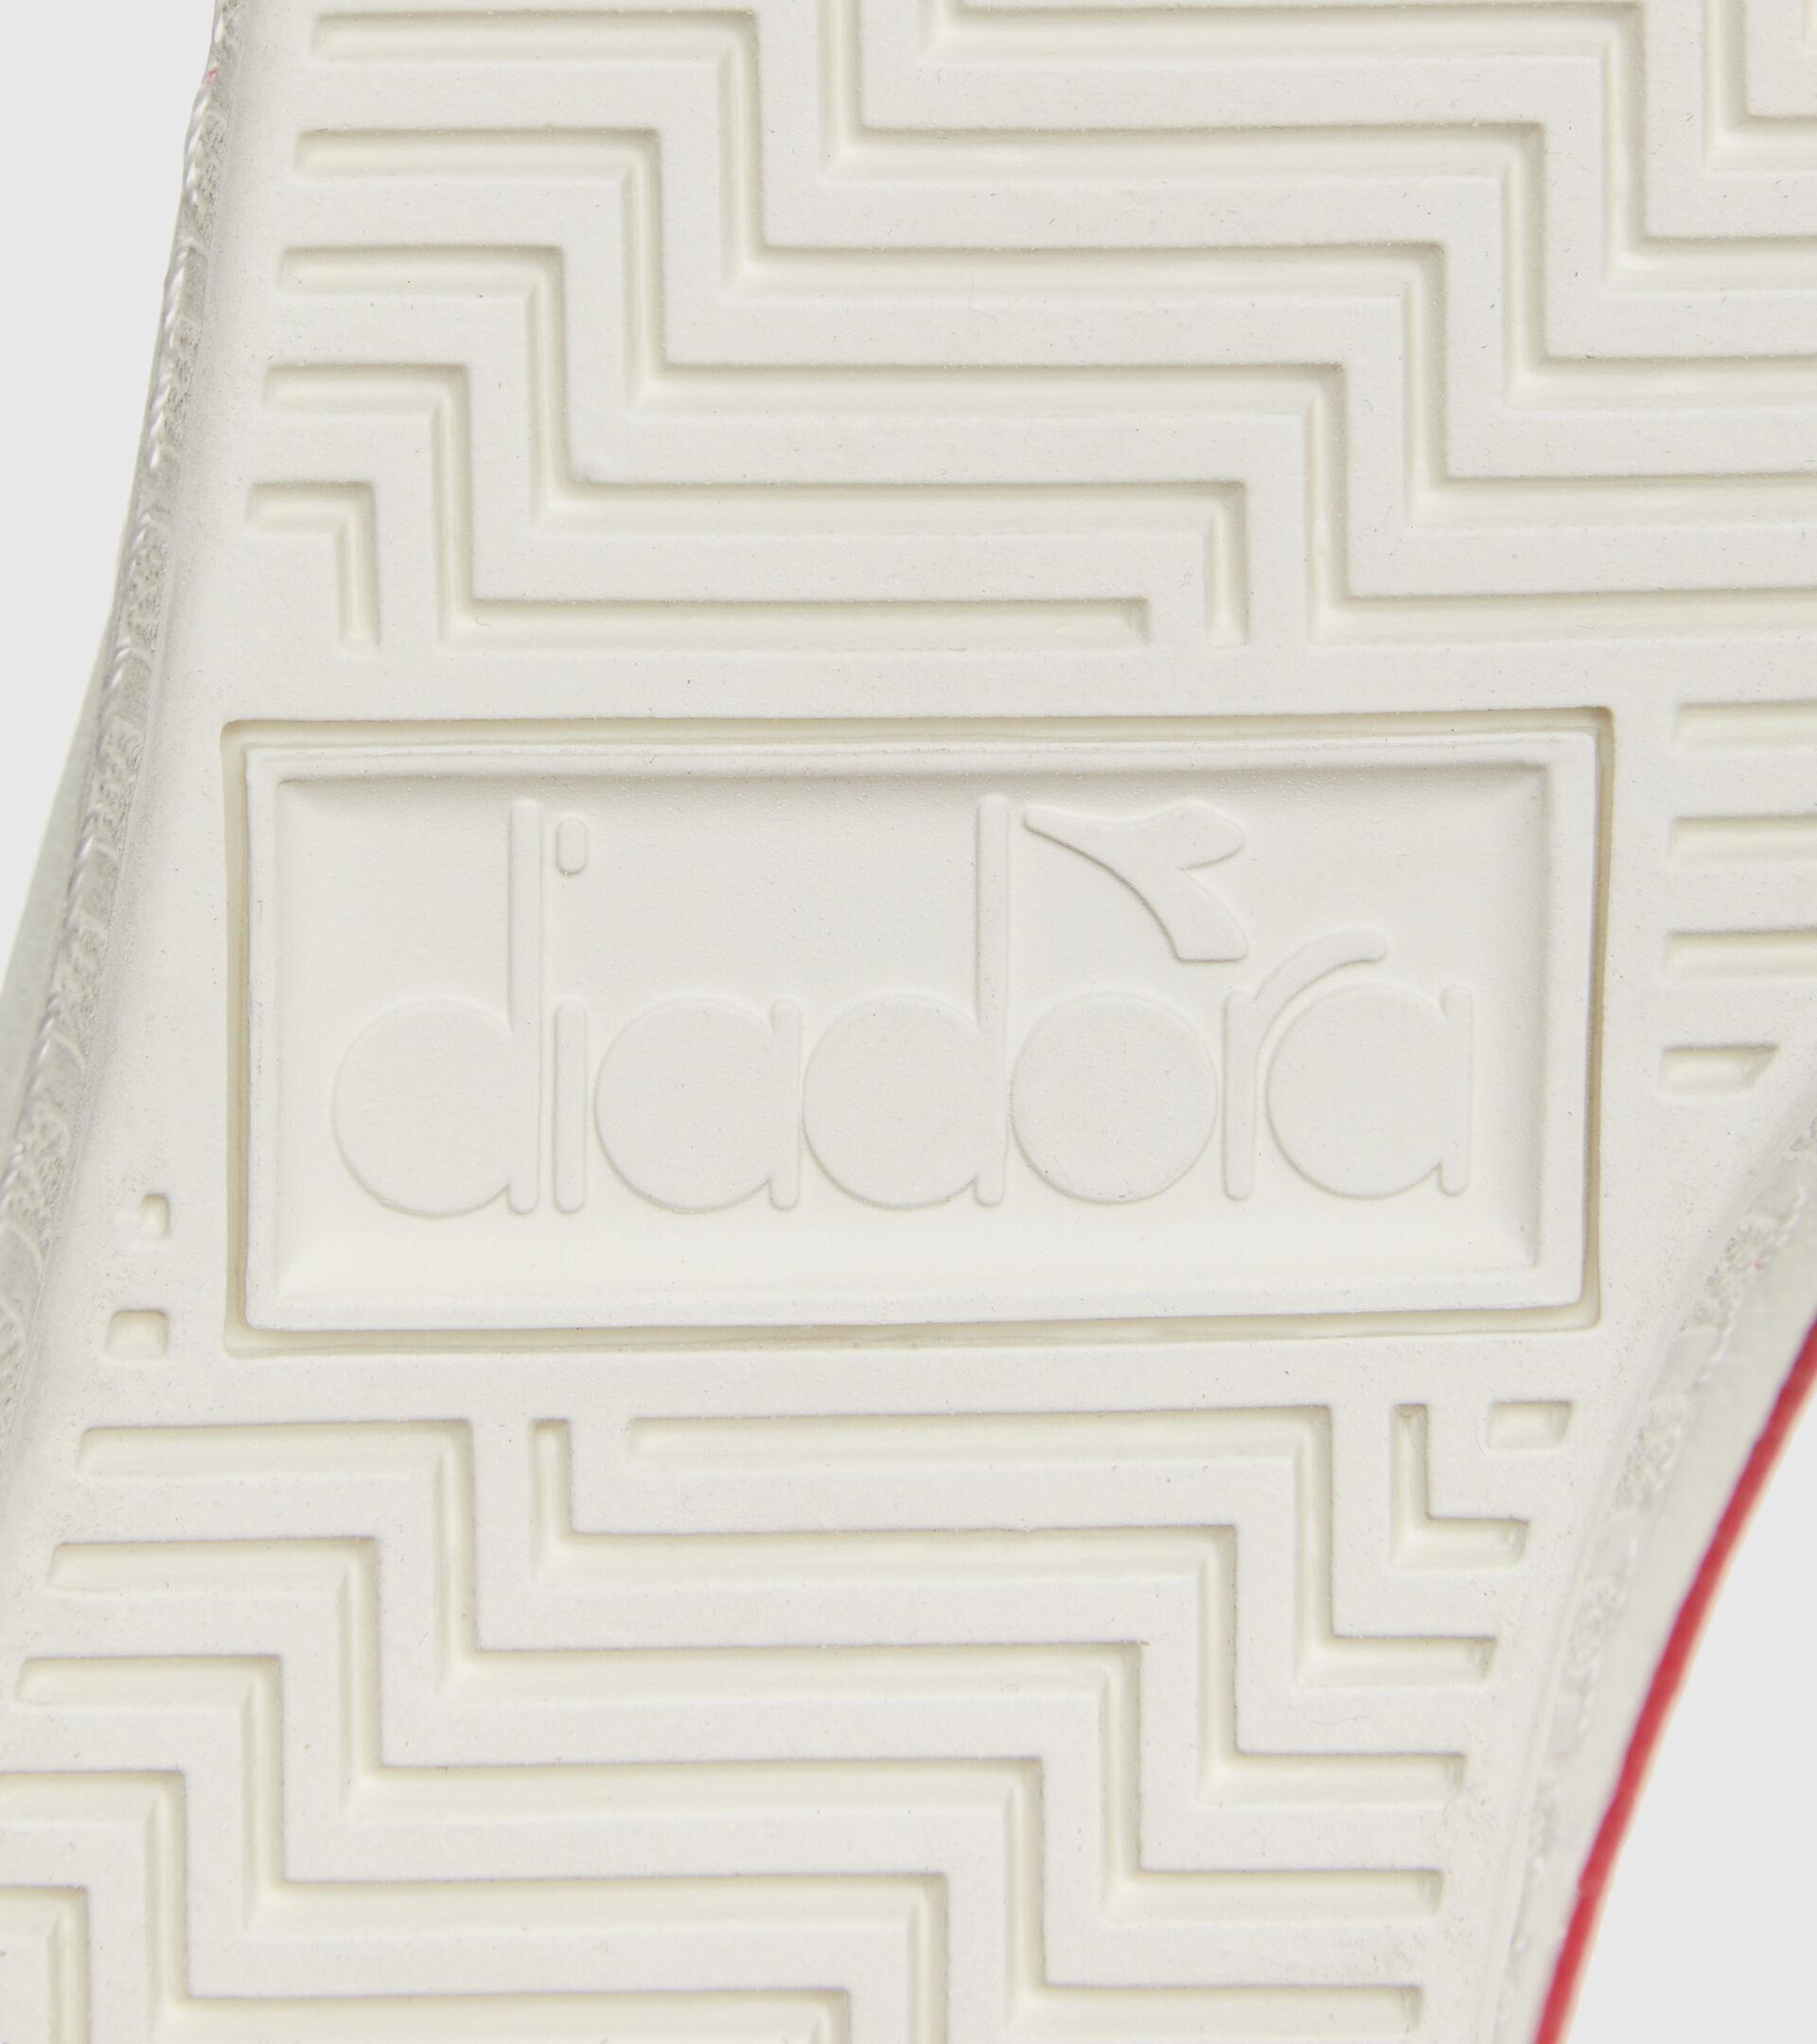 Footwear Sportswear UNISEX GAME L WAXED ROW CUT BLANCO/NARANJA.COM Diadora